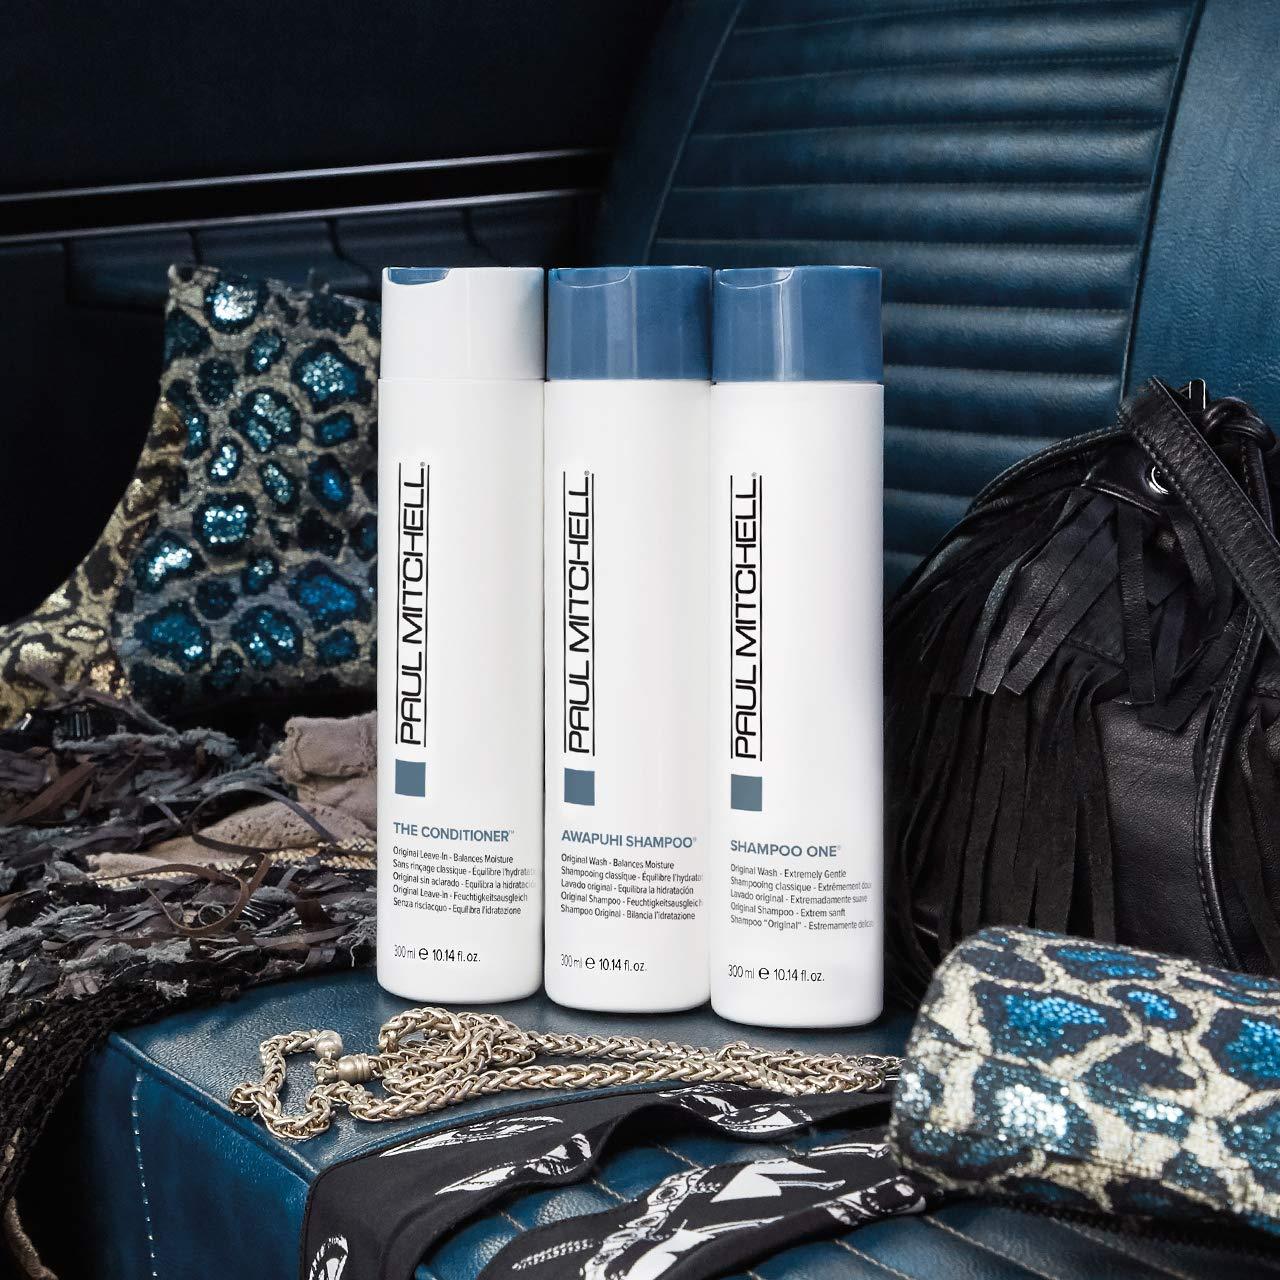 Paul Mitchell Awapuhi Shampoo, For All Hair Types: Premium Beauty